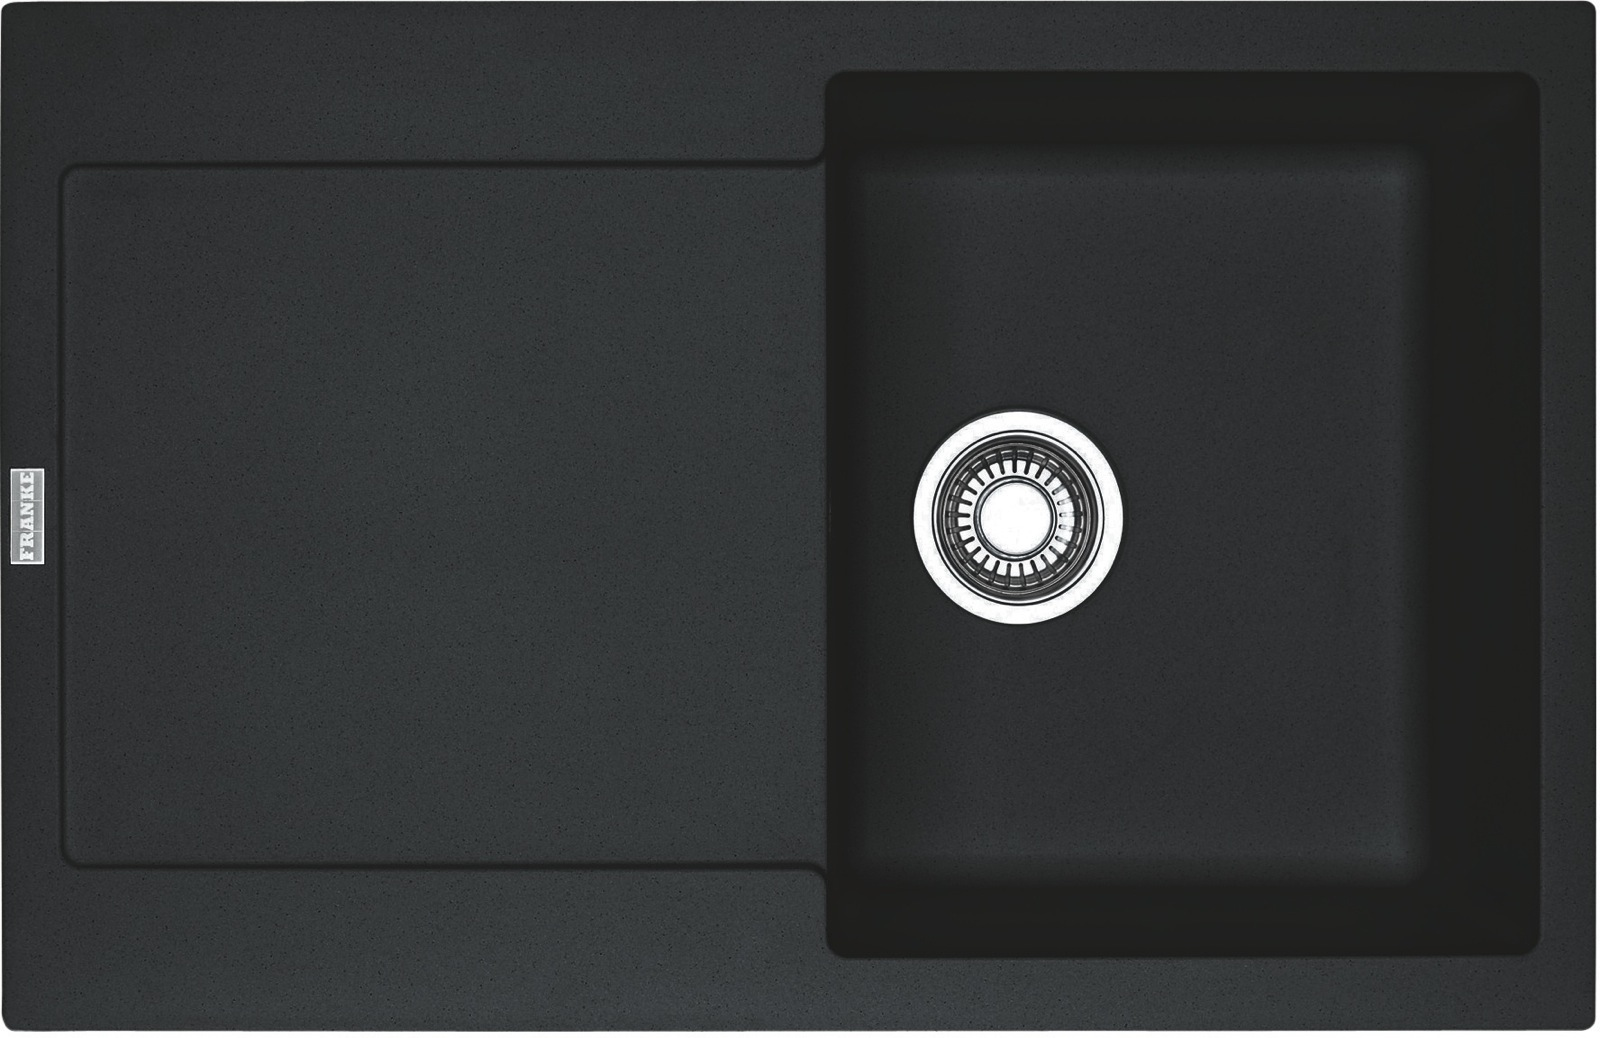 Chiuveta bucatarie fragranite Franke Maris MRG 611 reversibila 780x500mm tehnologie Sanitized Nero imagine sensodays.ro